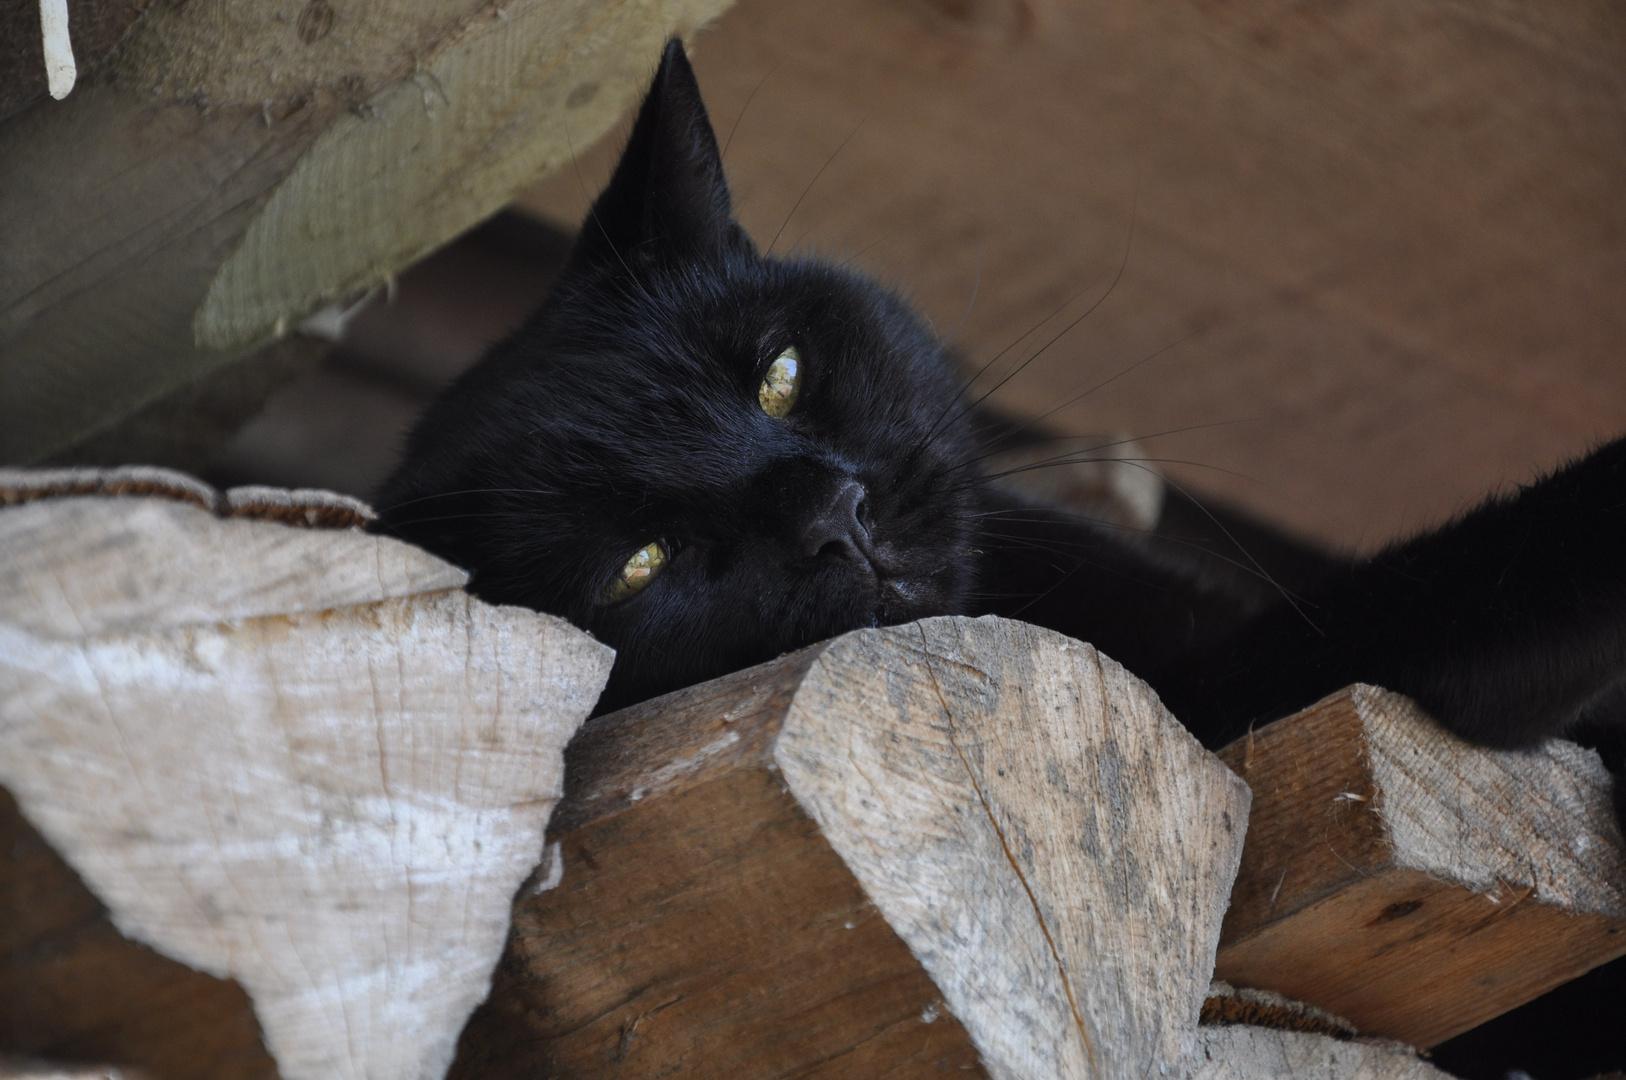 Simba the black cat